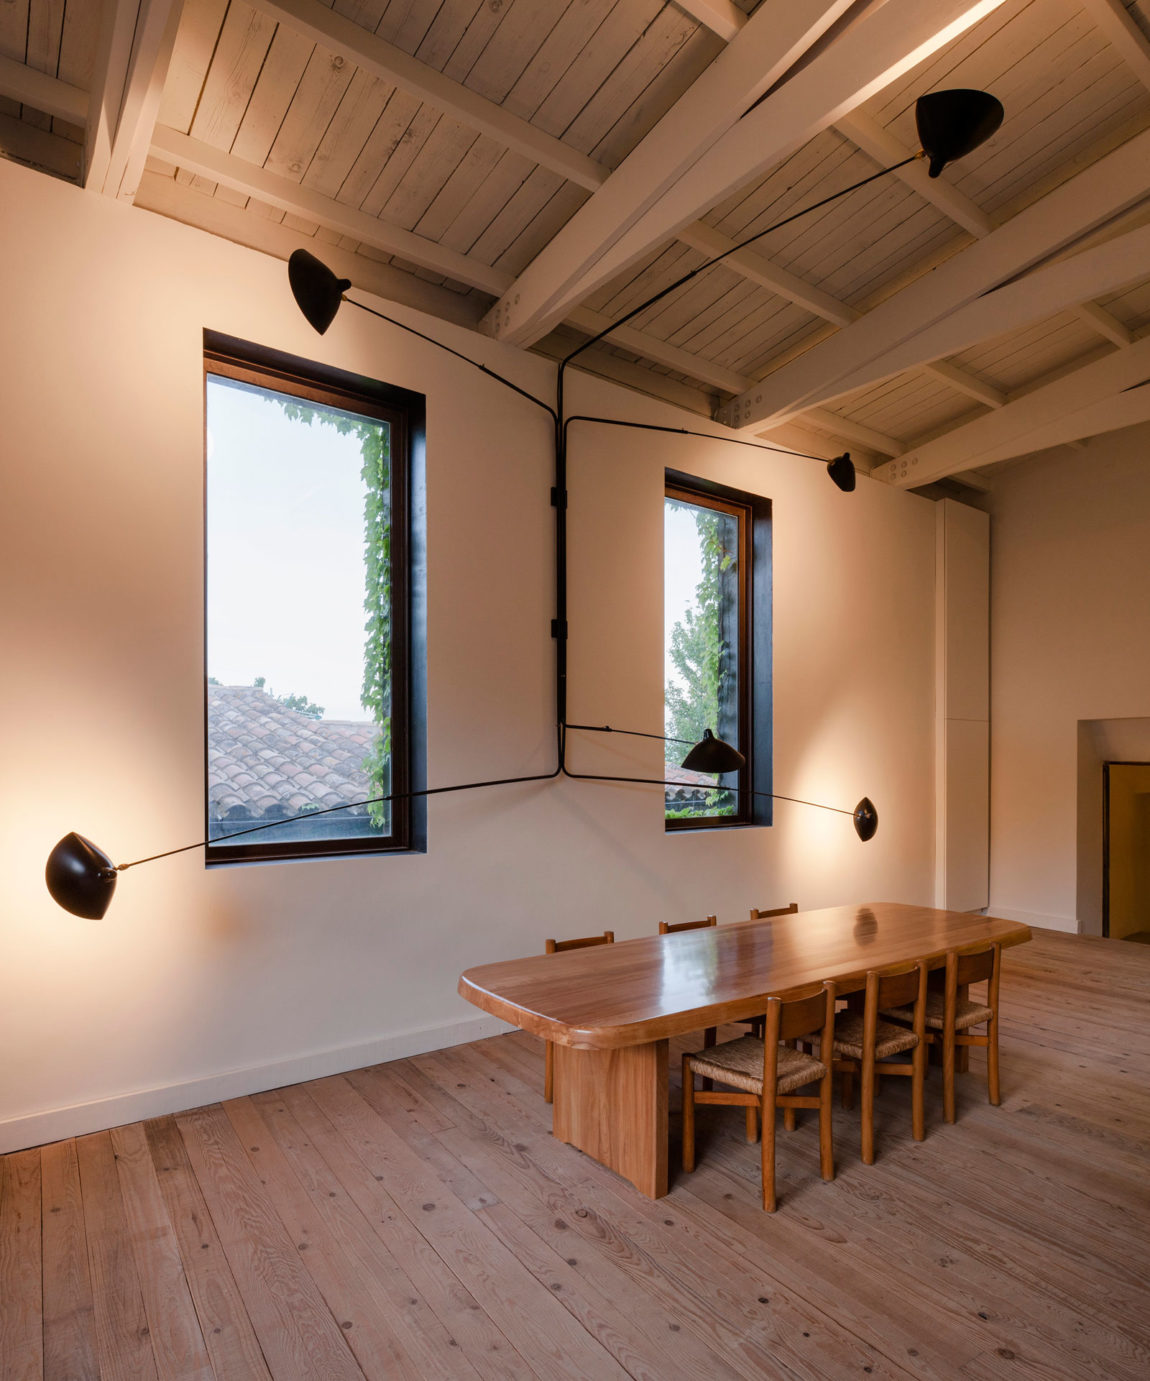 House in L'Empordà by Francesc Rifé Studio (12)